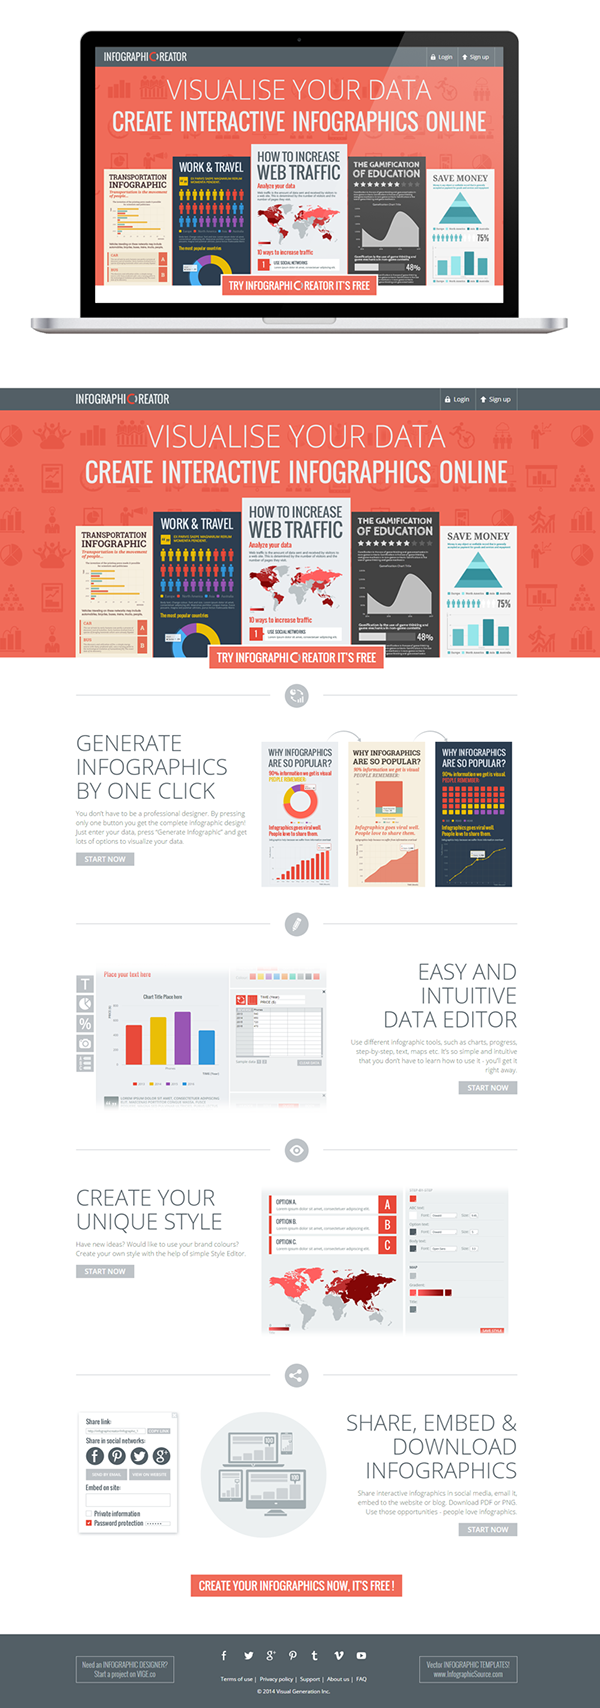 Create infographics online free